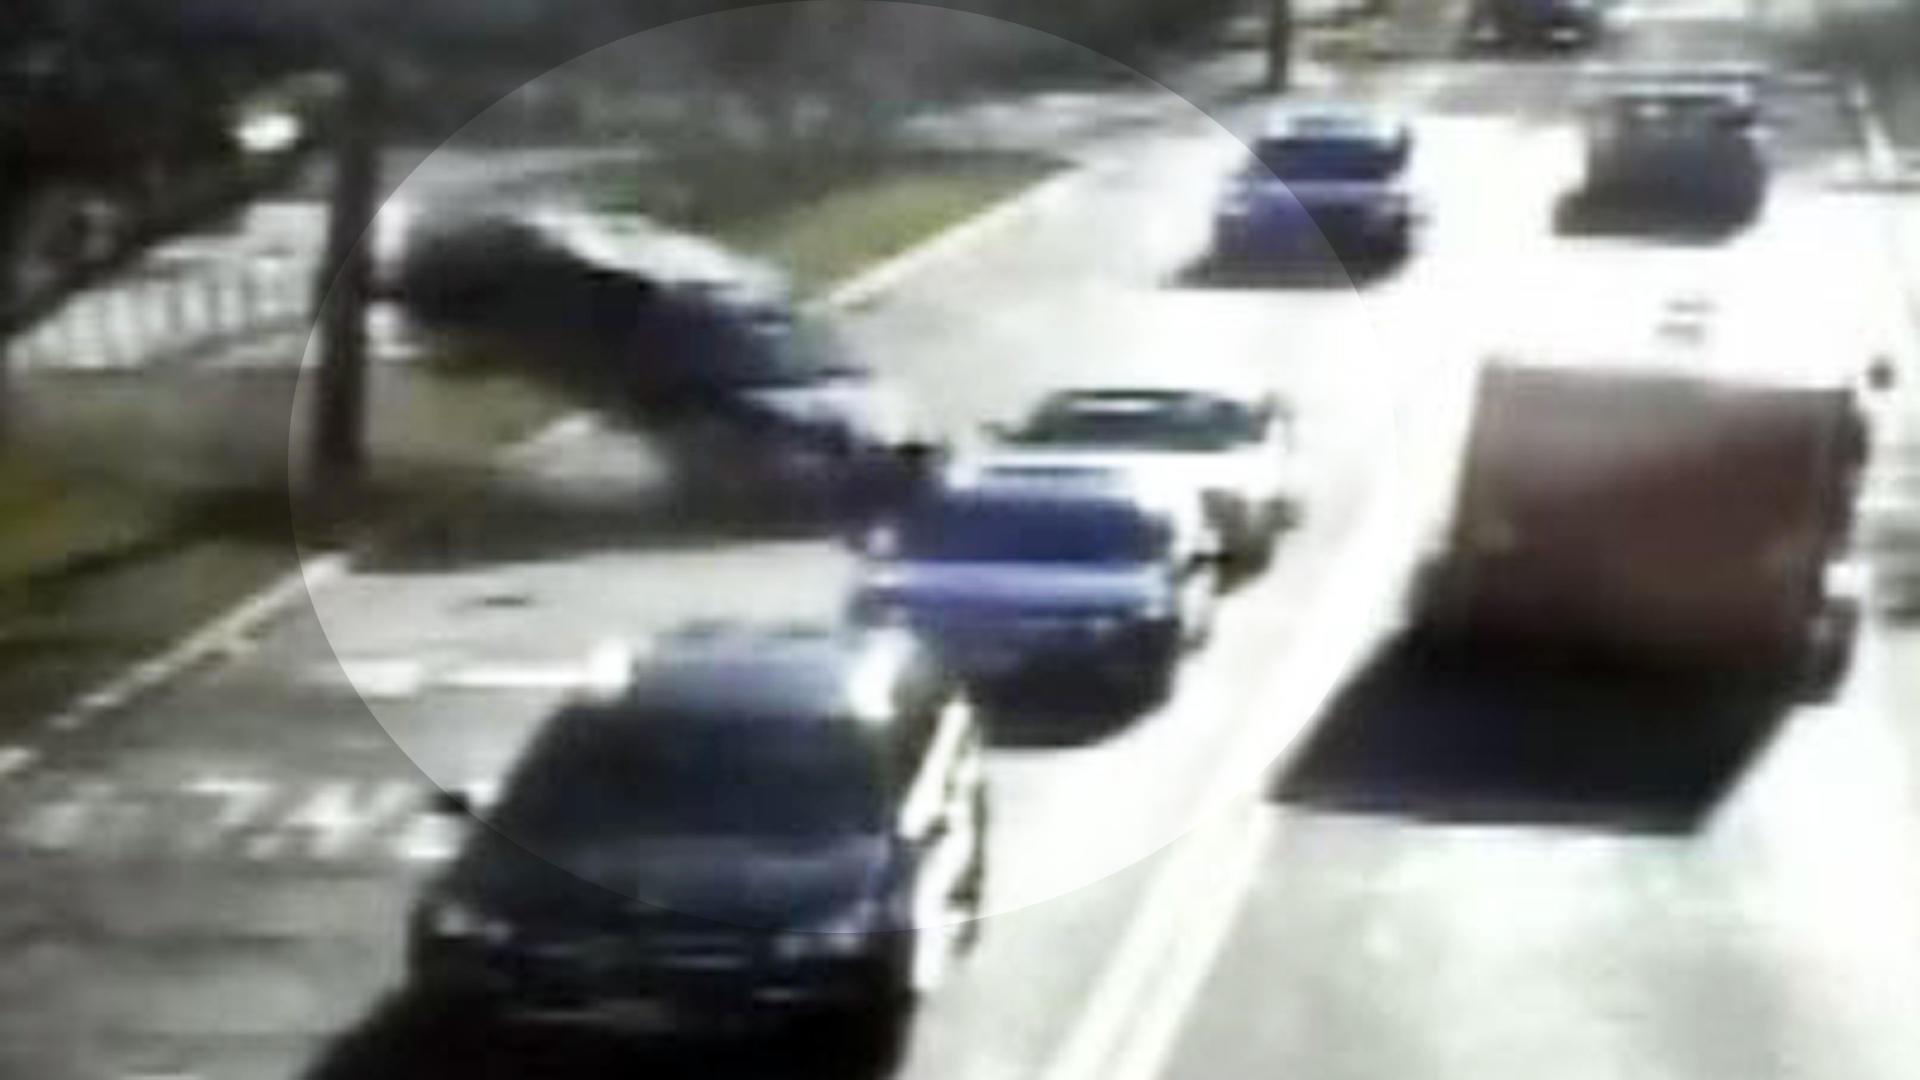 Wild car crash caught on tape - CBS News